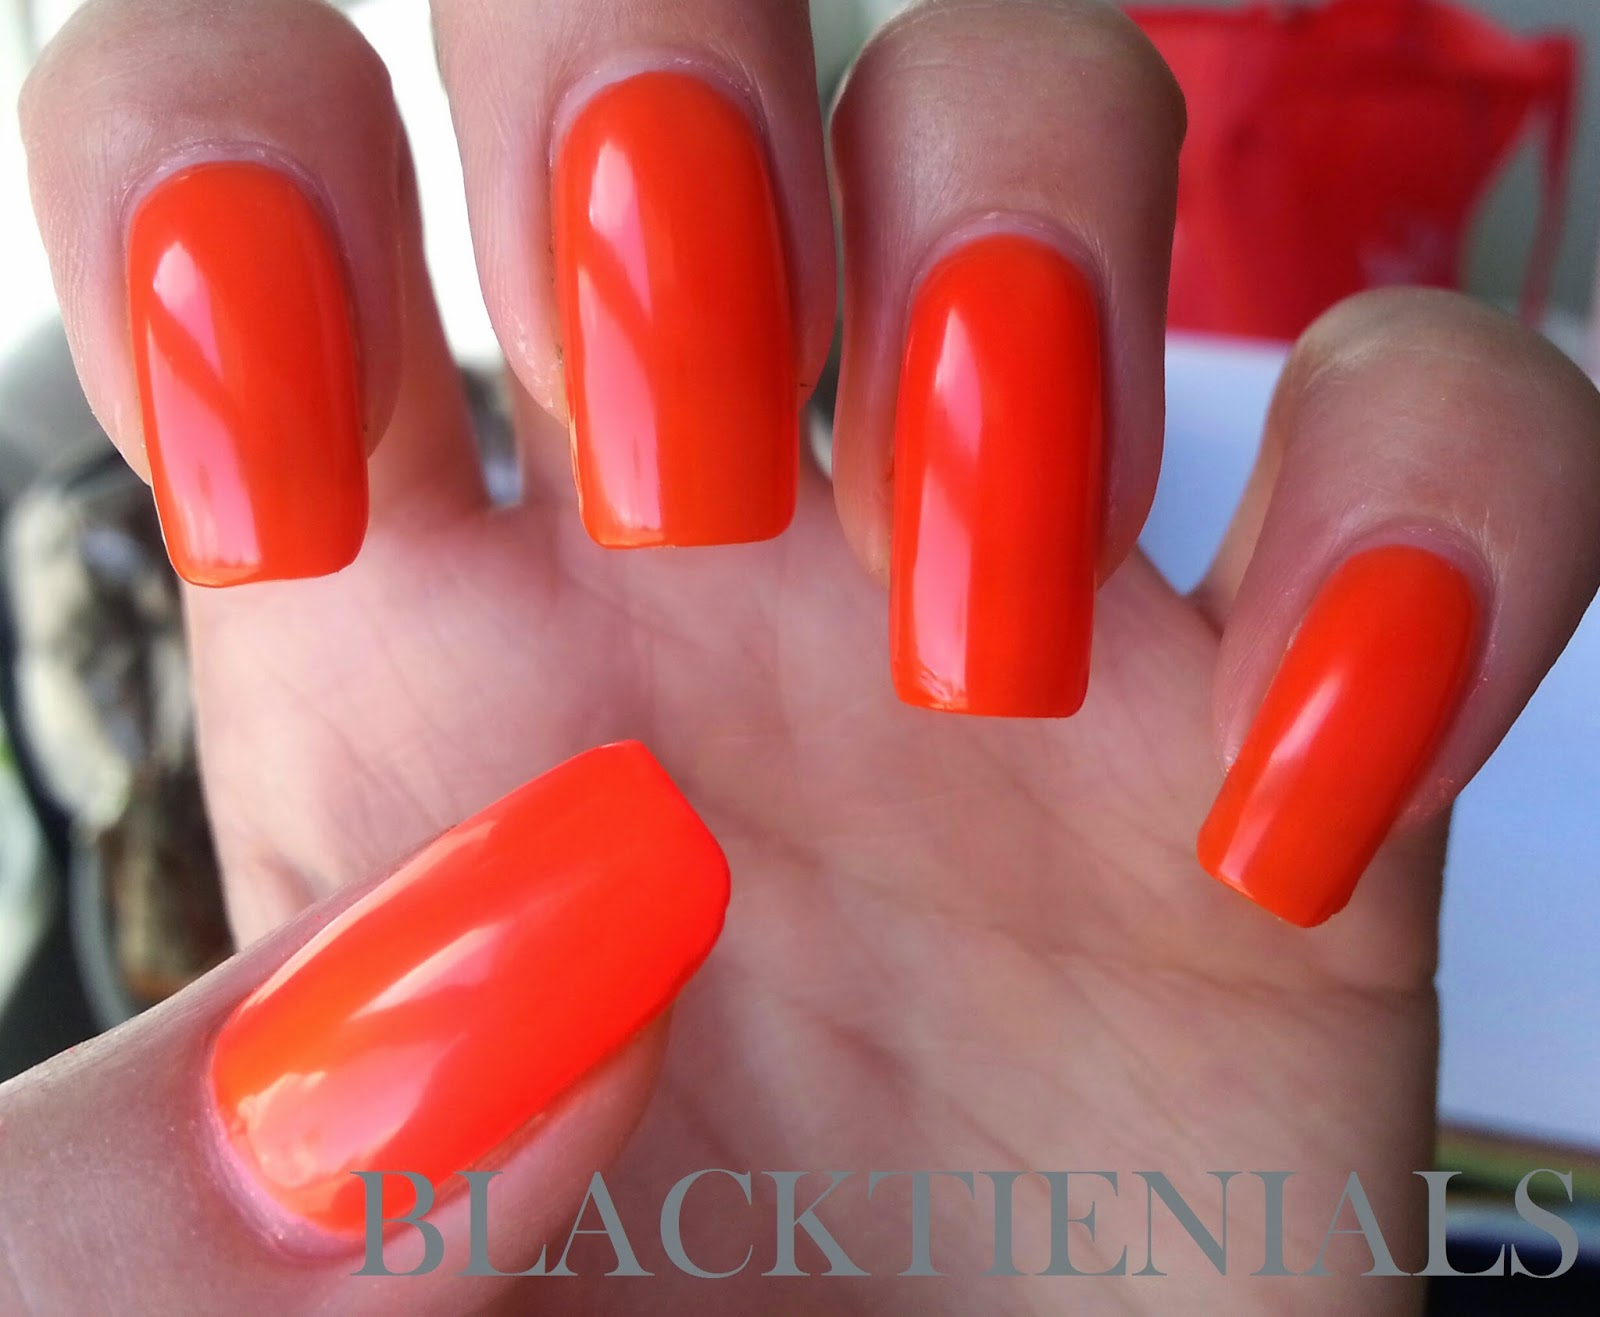 Black Tie Nails: Neon Orange Comparison (think Traffic Cones!)